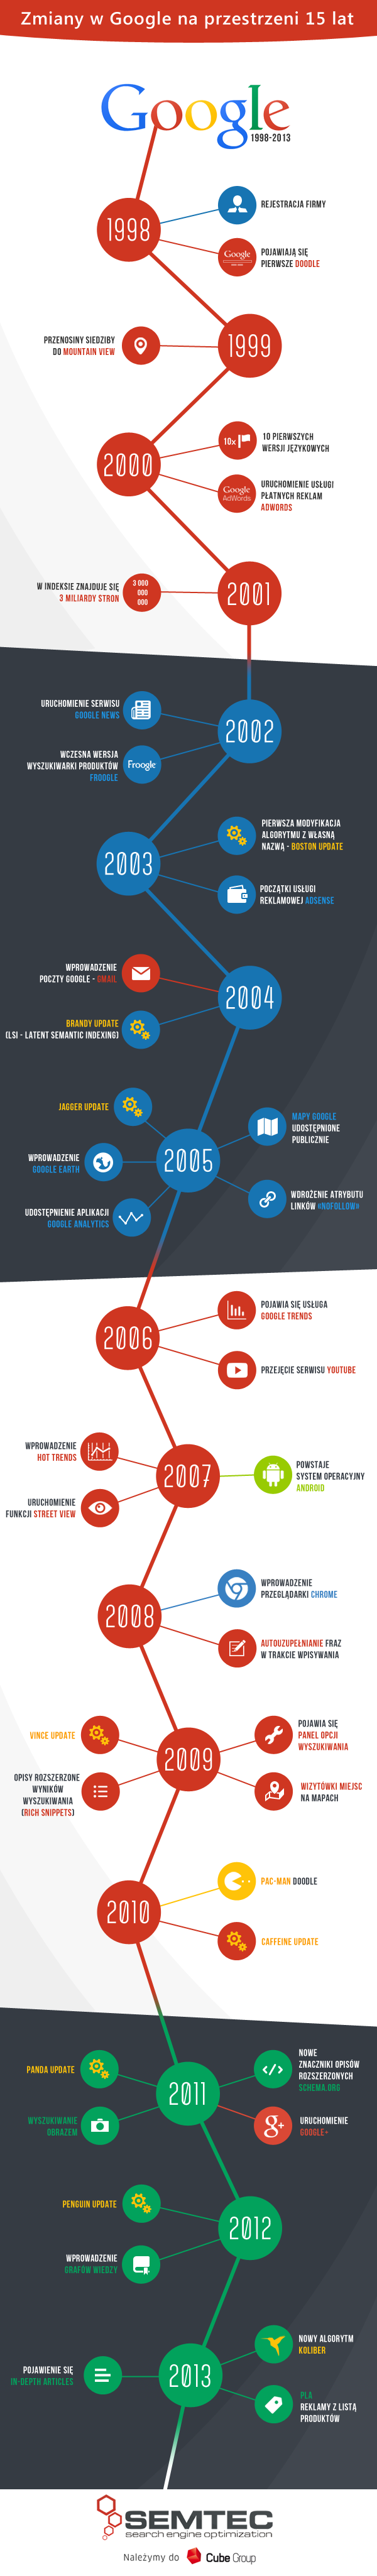 historia zmian w Google 1998-2013 - infografika